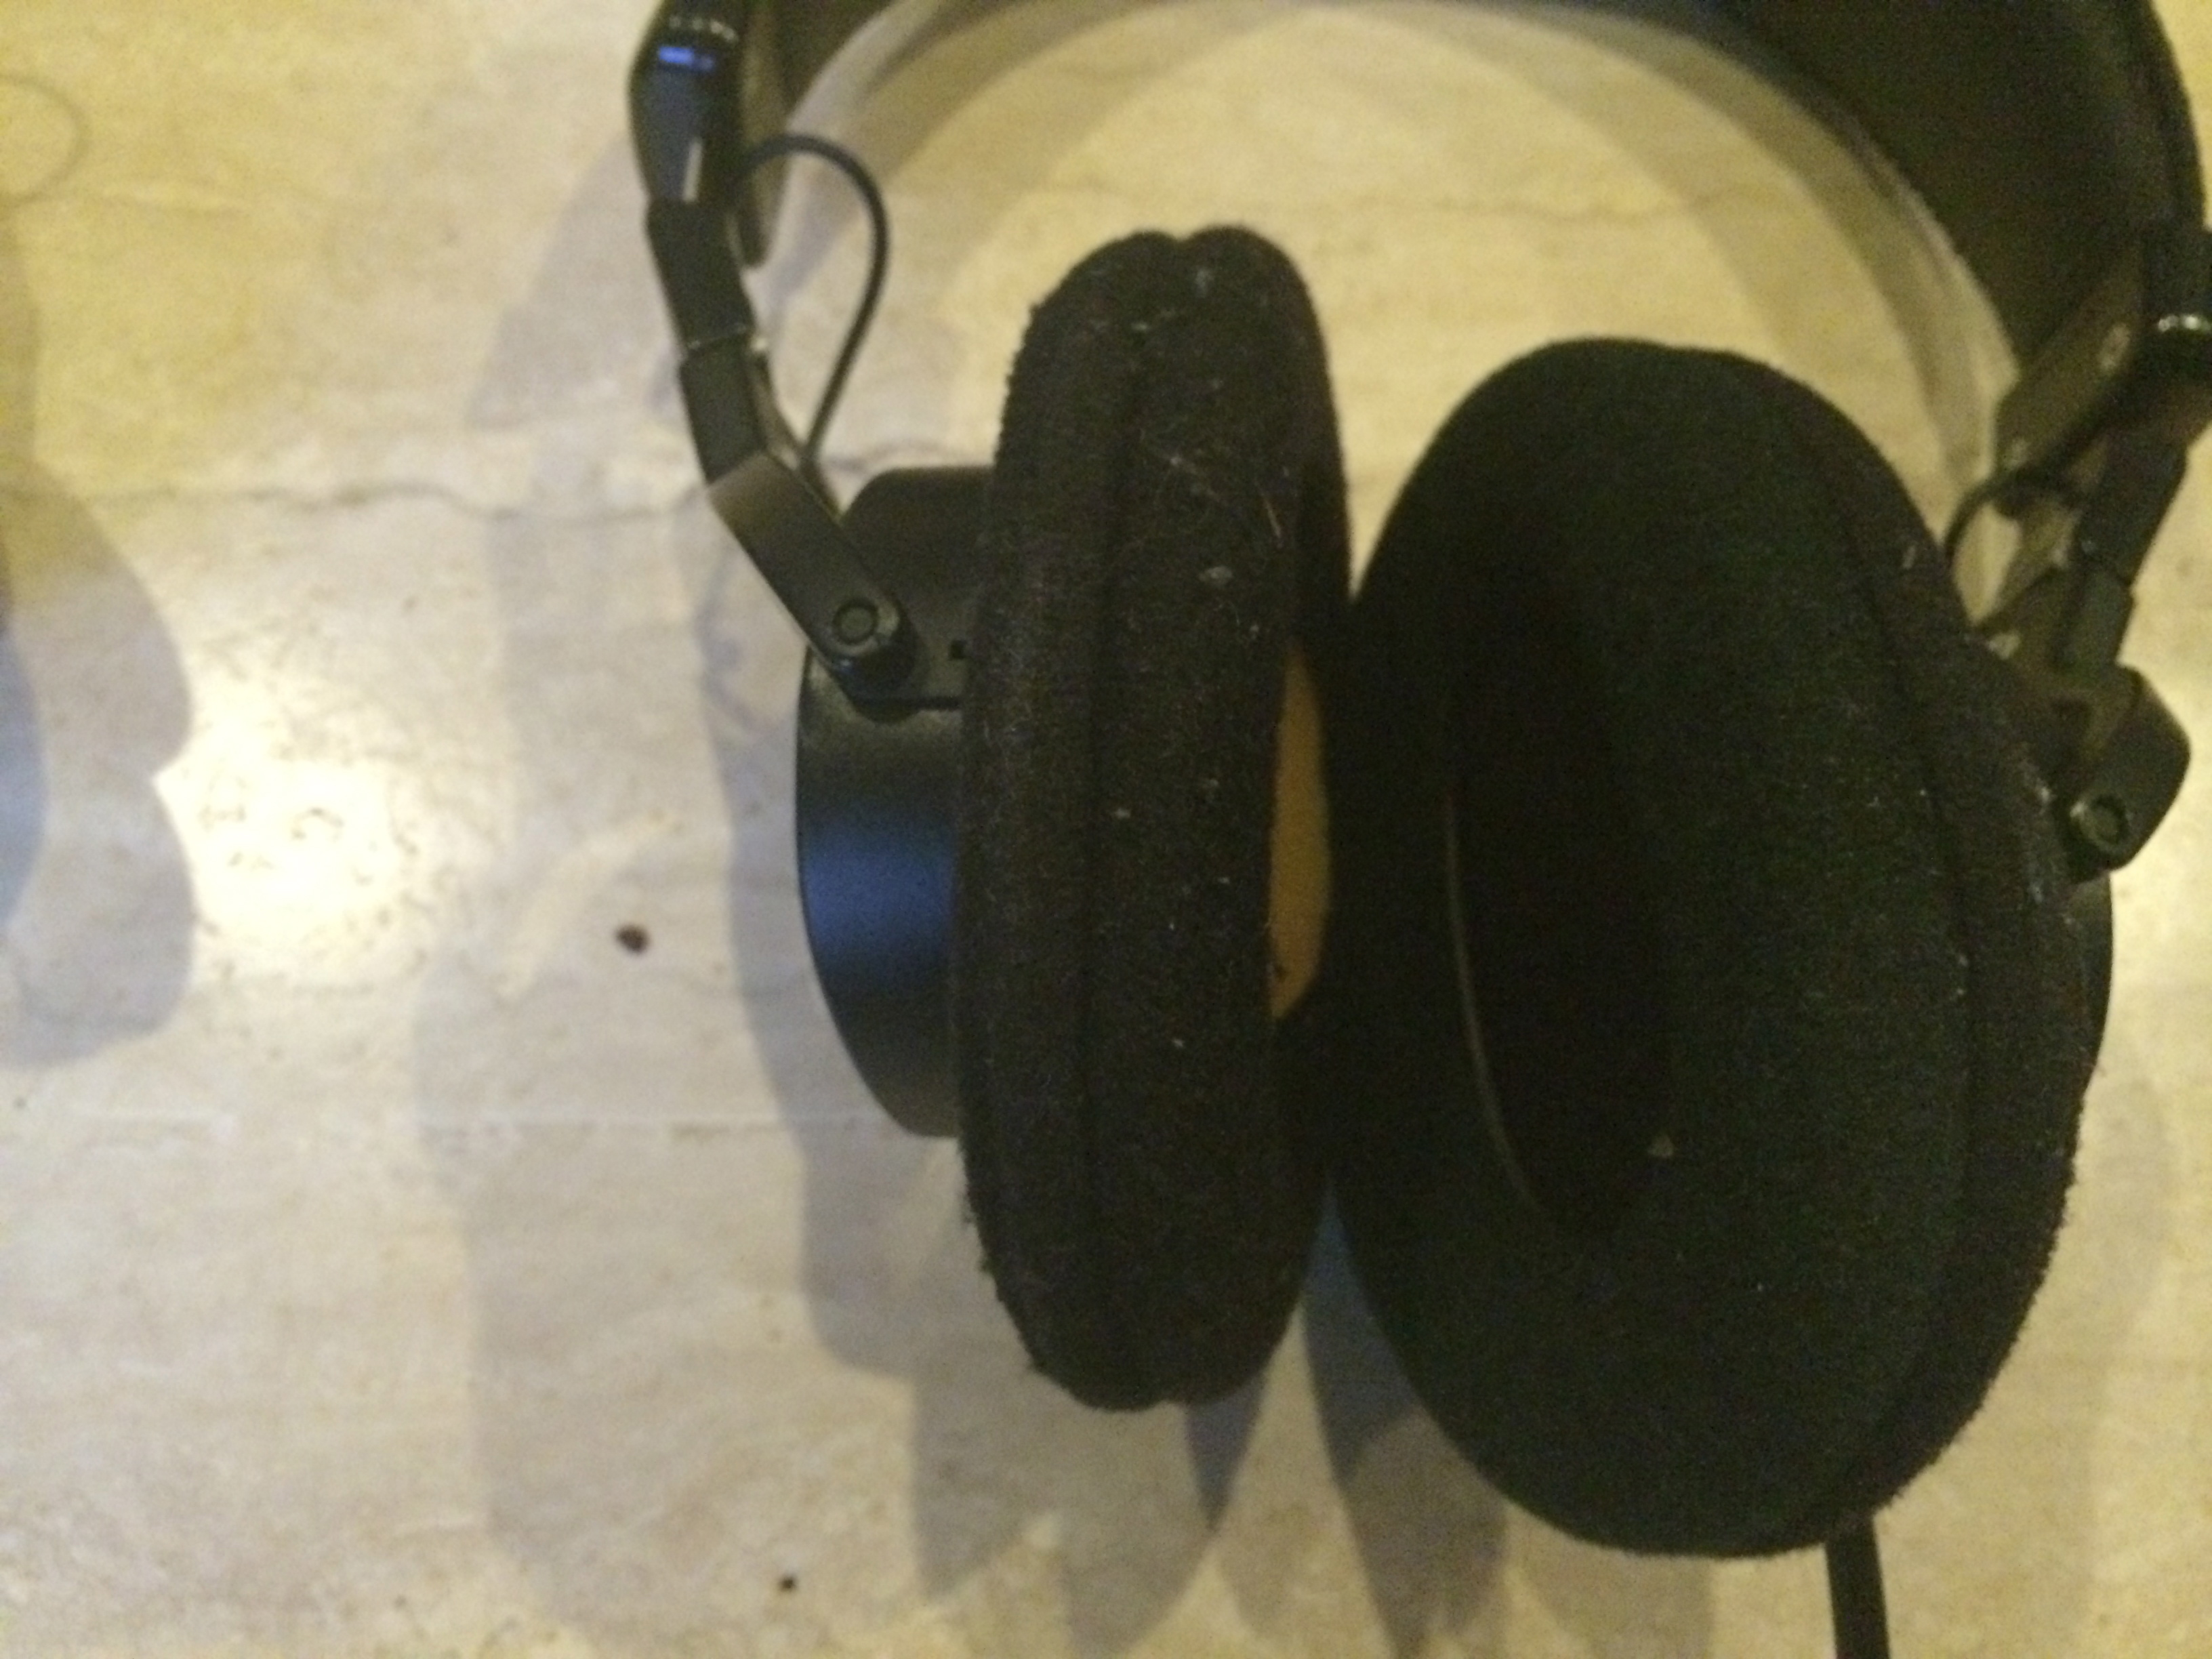 SONY ヘッドホン,MDR-7506,MDR-CD900ST,おすすめ ヘッドホン,ヘッドフォン